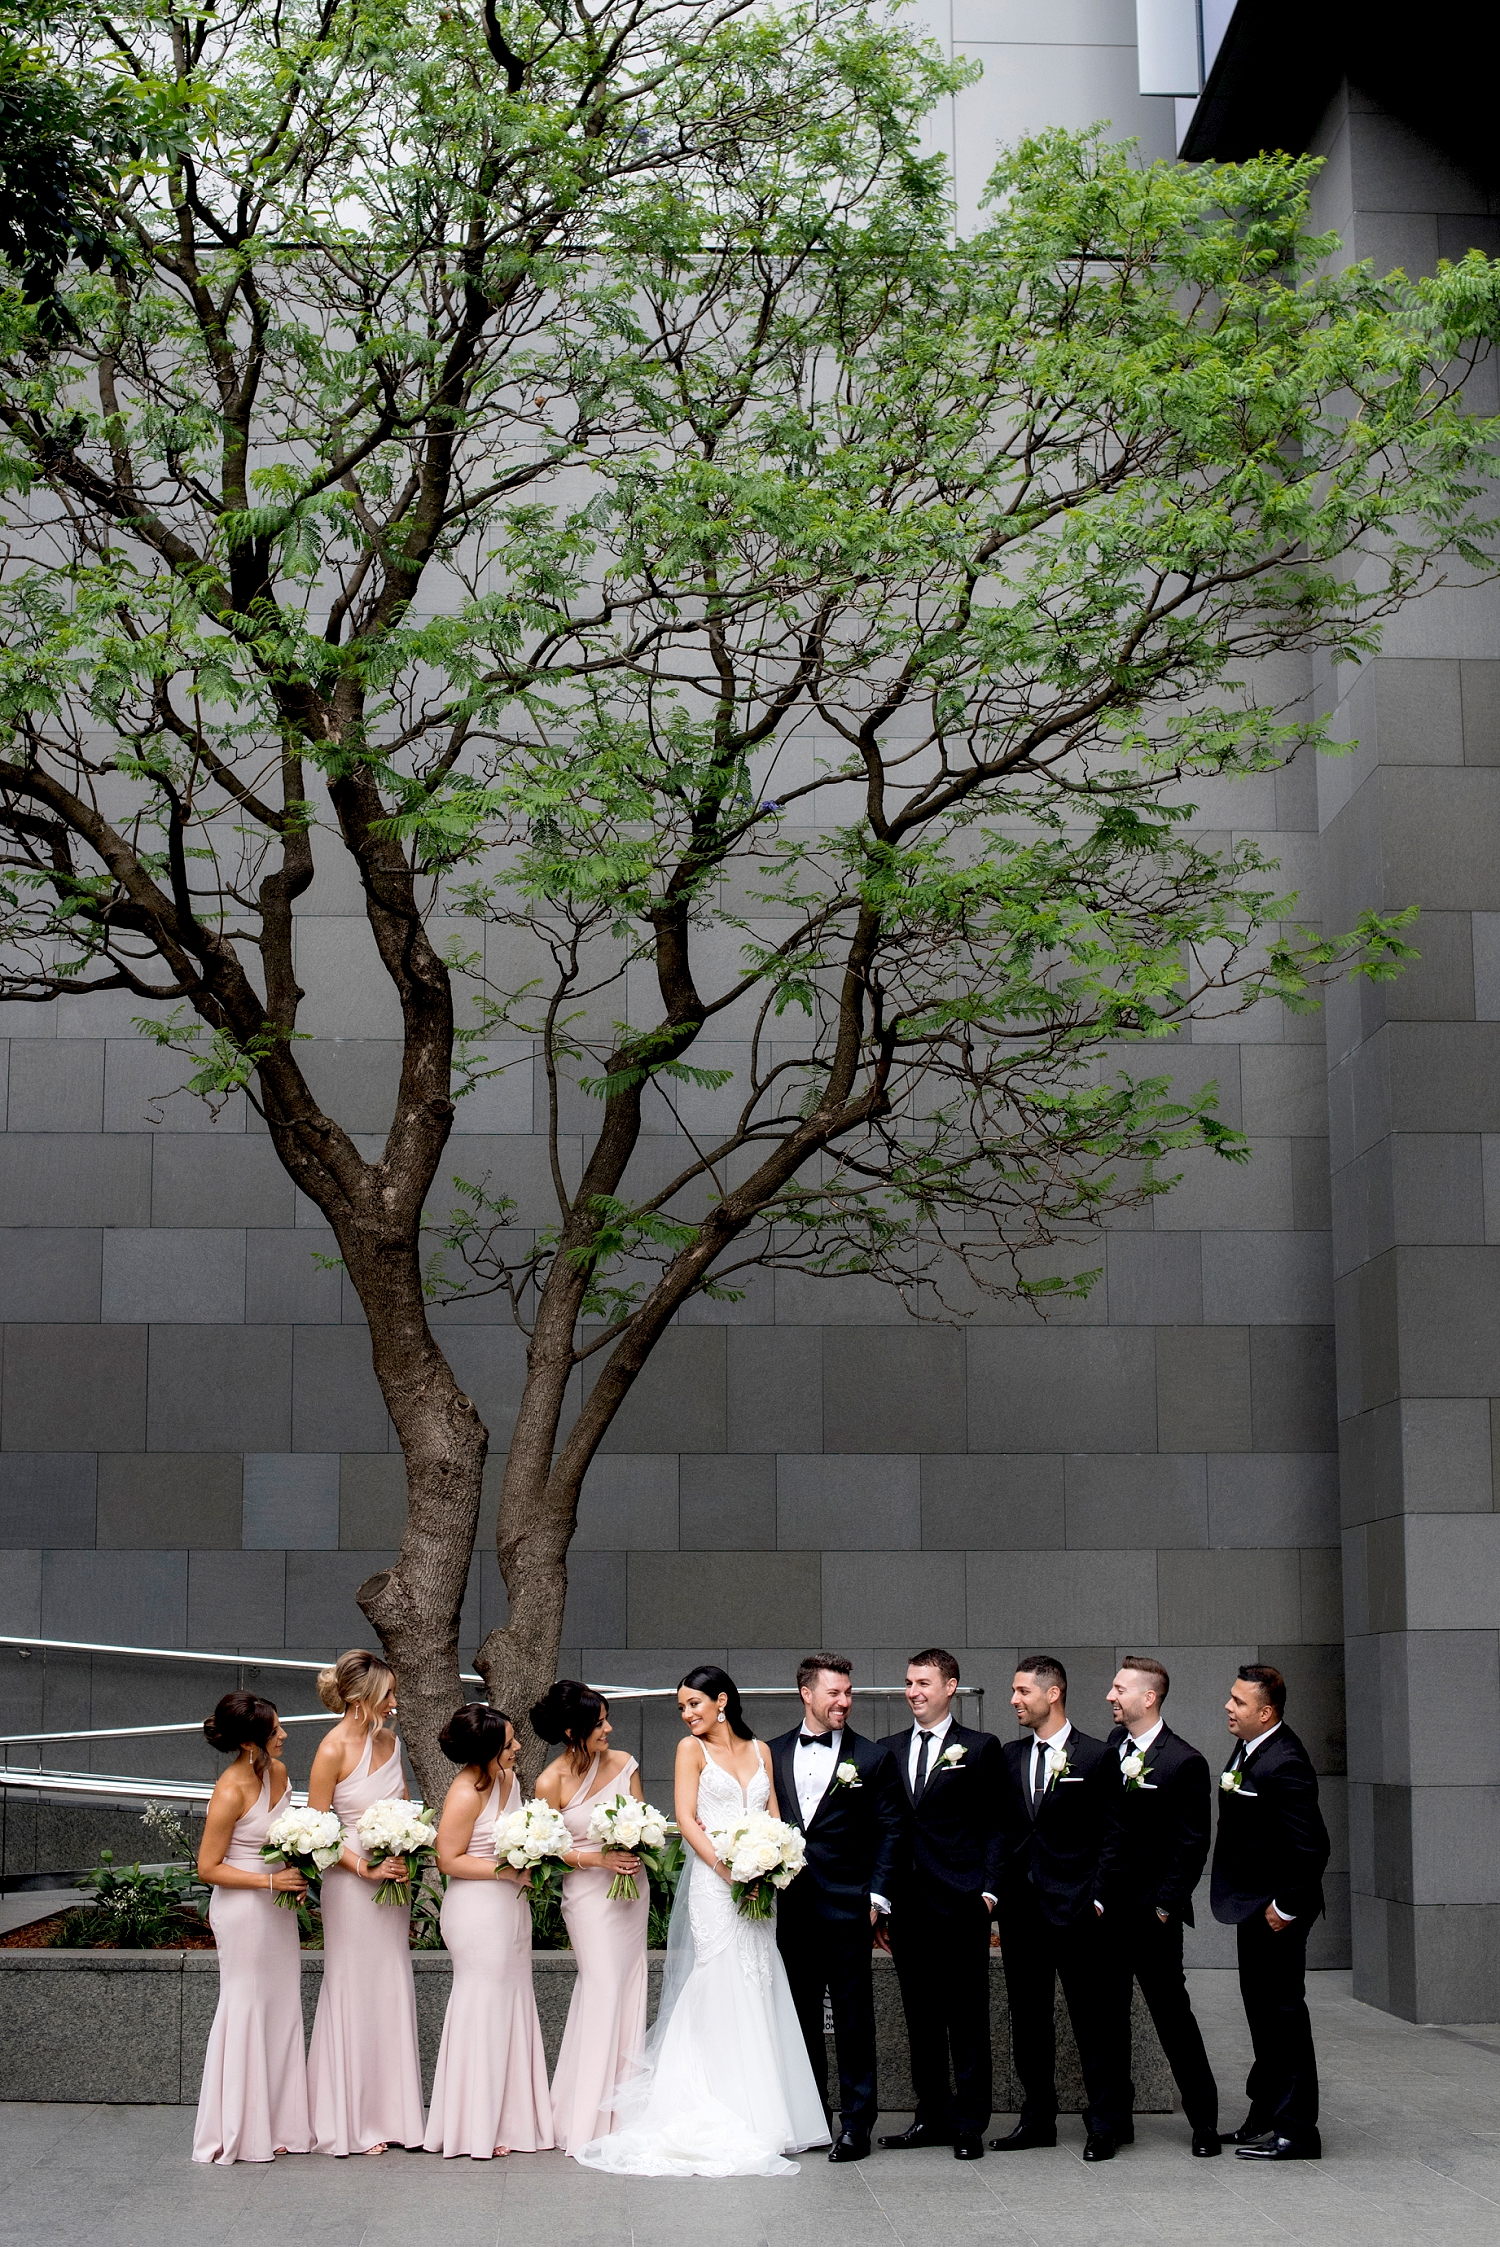 52_treasury buildings wedding perth.jpg